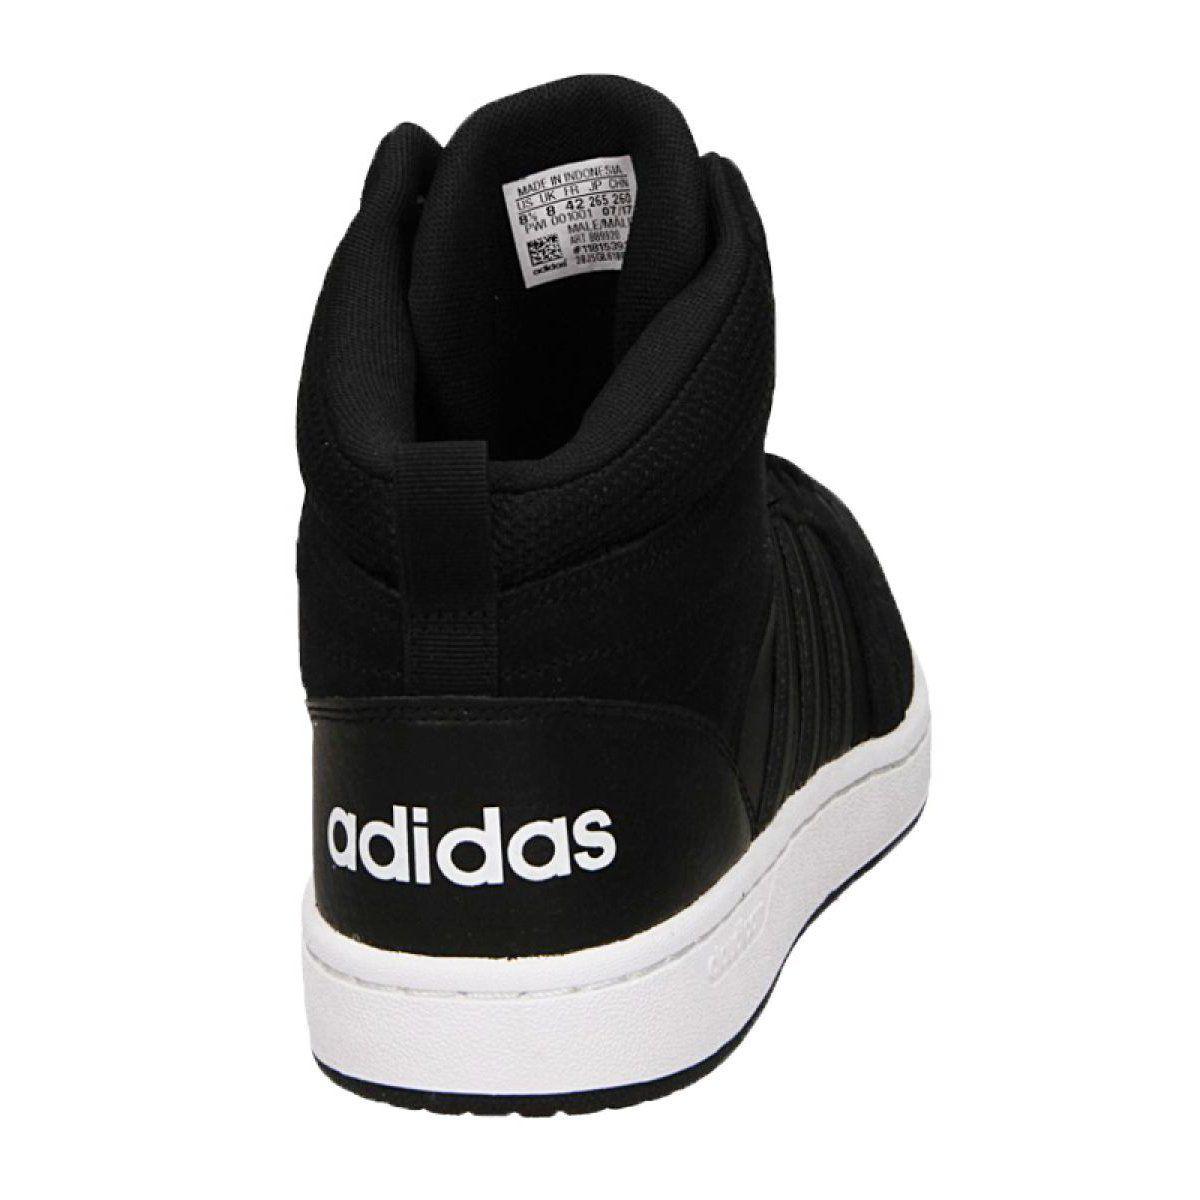 Adidas Cloudfoam Super Hoops Mid M Bb9920 Shoes Black Adidas Cloudfoam Black Shoes Sports Shoes Adidas